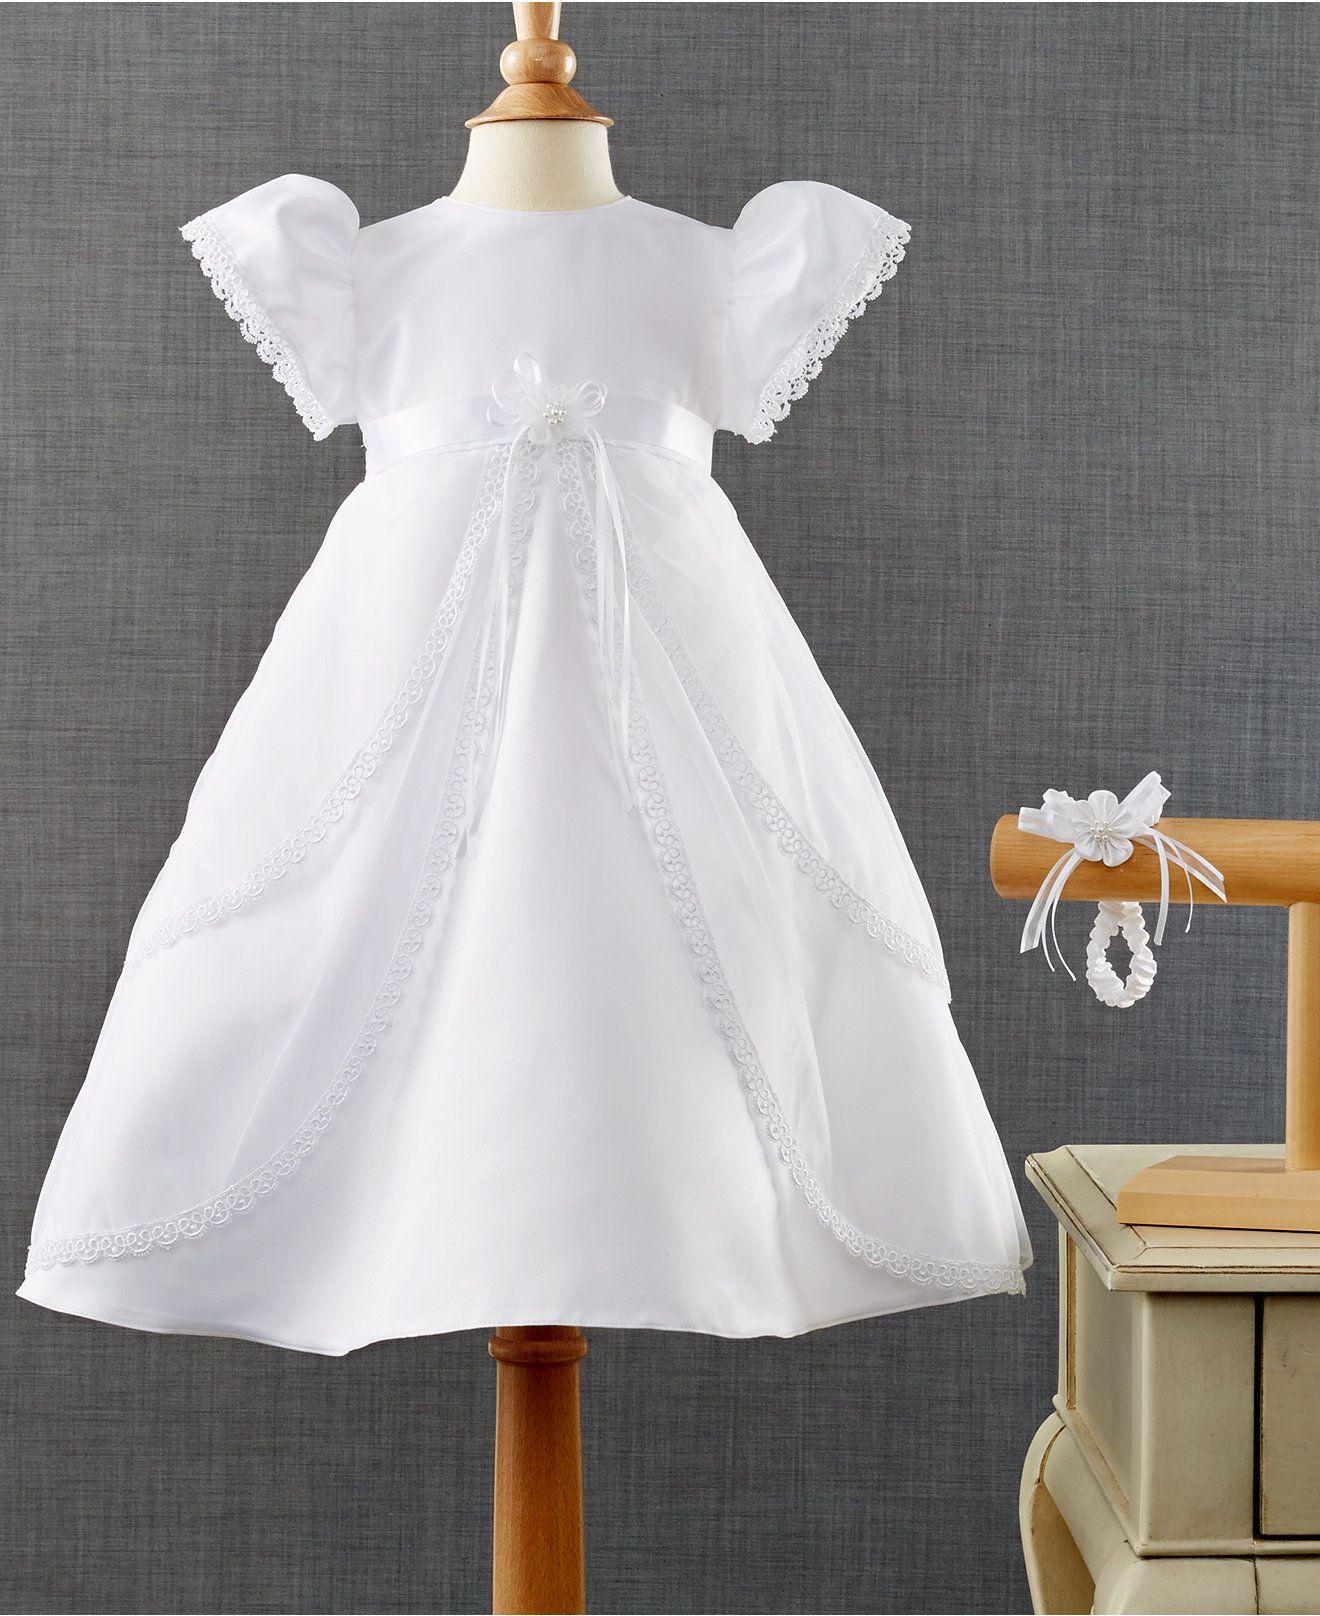 c2b5f2e96 (Dry clean) Lauren Madison Baby Girls' 2-Piece Headband & Christening Dress  Set - Sets - Kids & Baby - Macy's